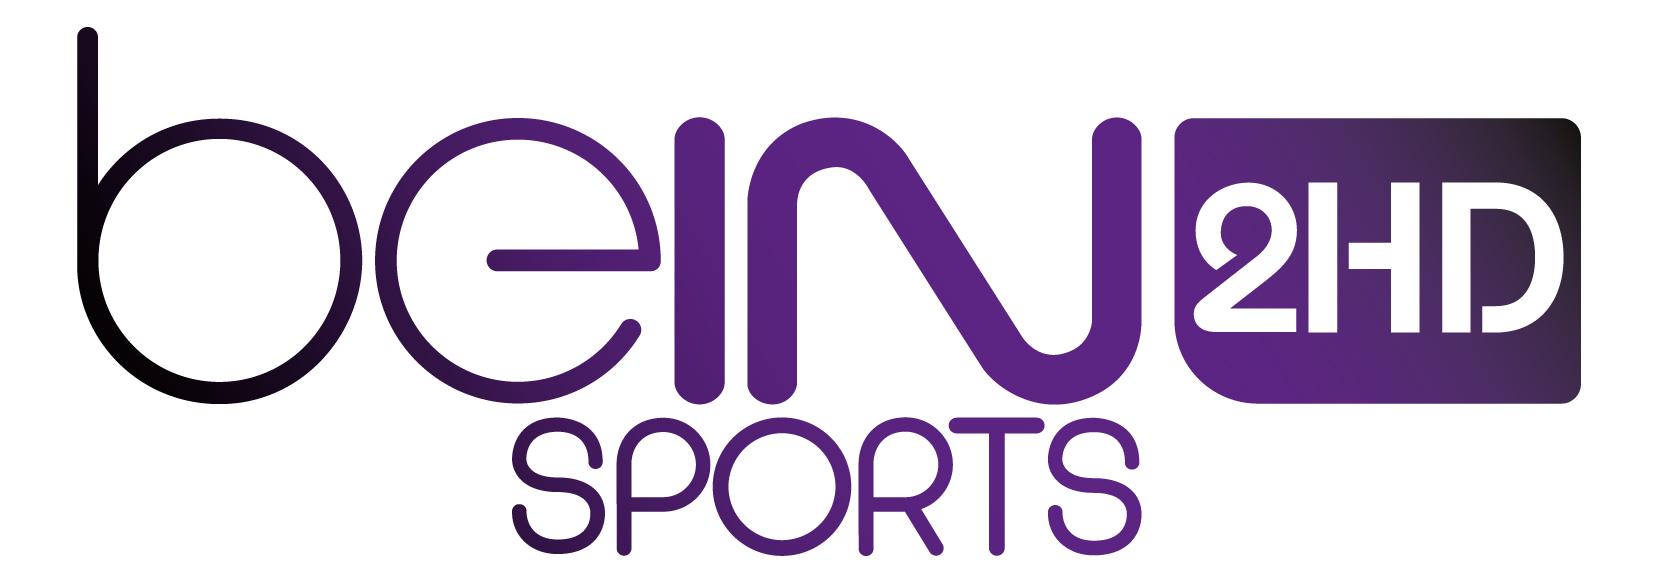 Bein Sports Wikipedia Autos Post